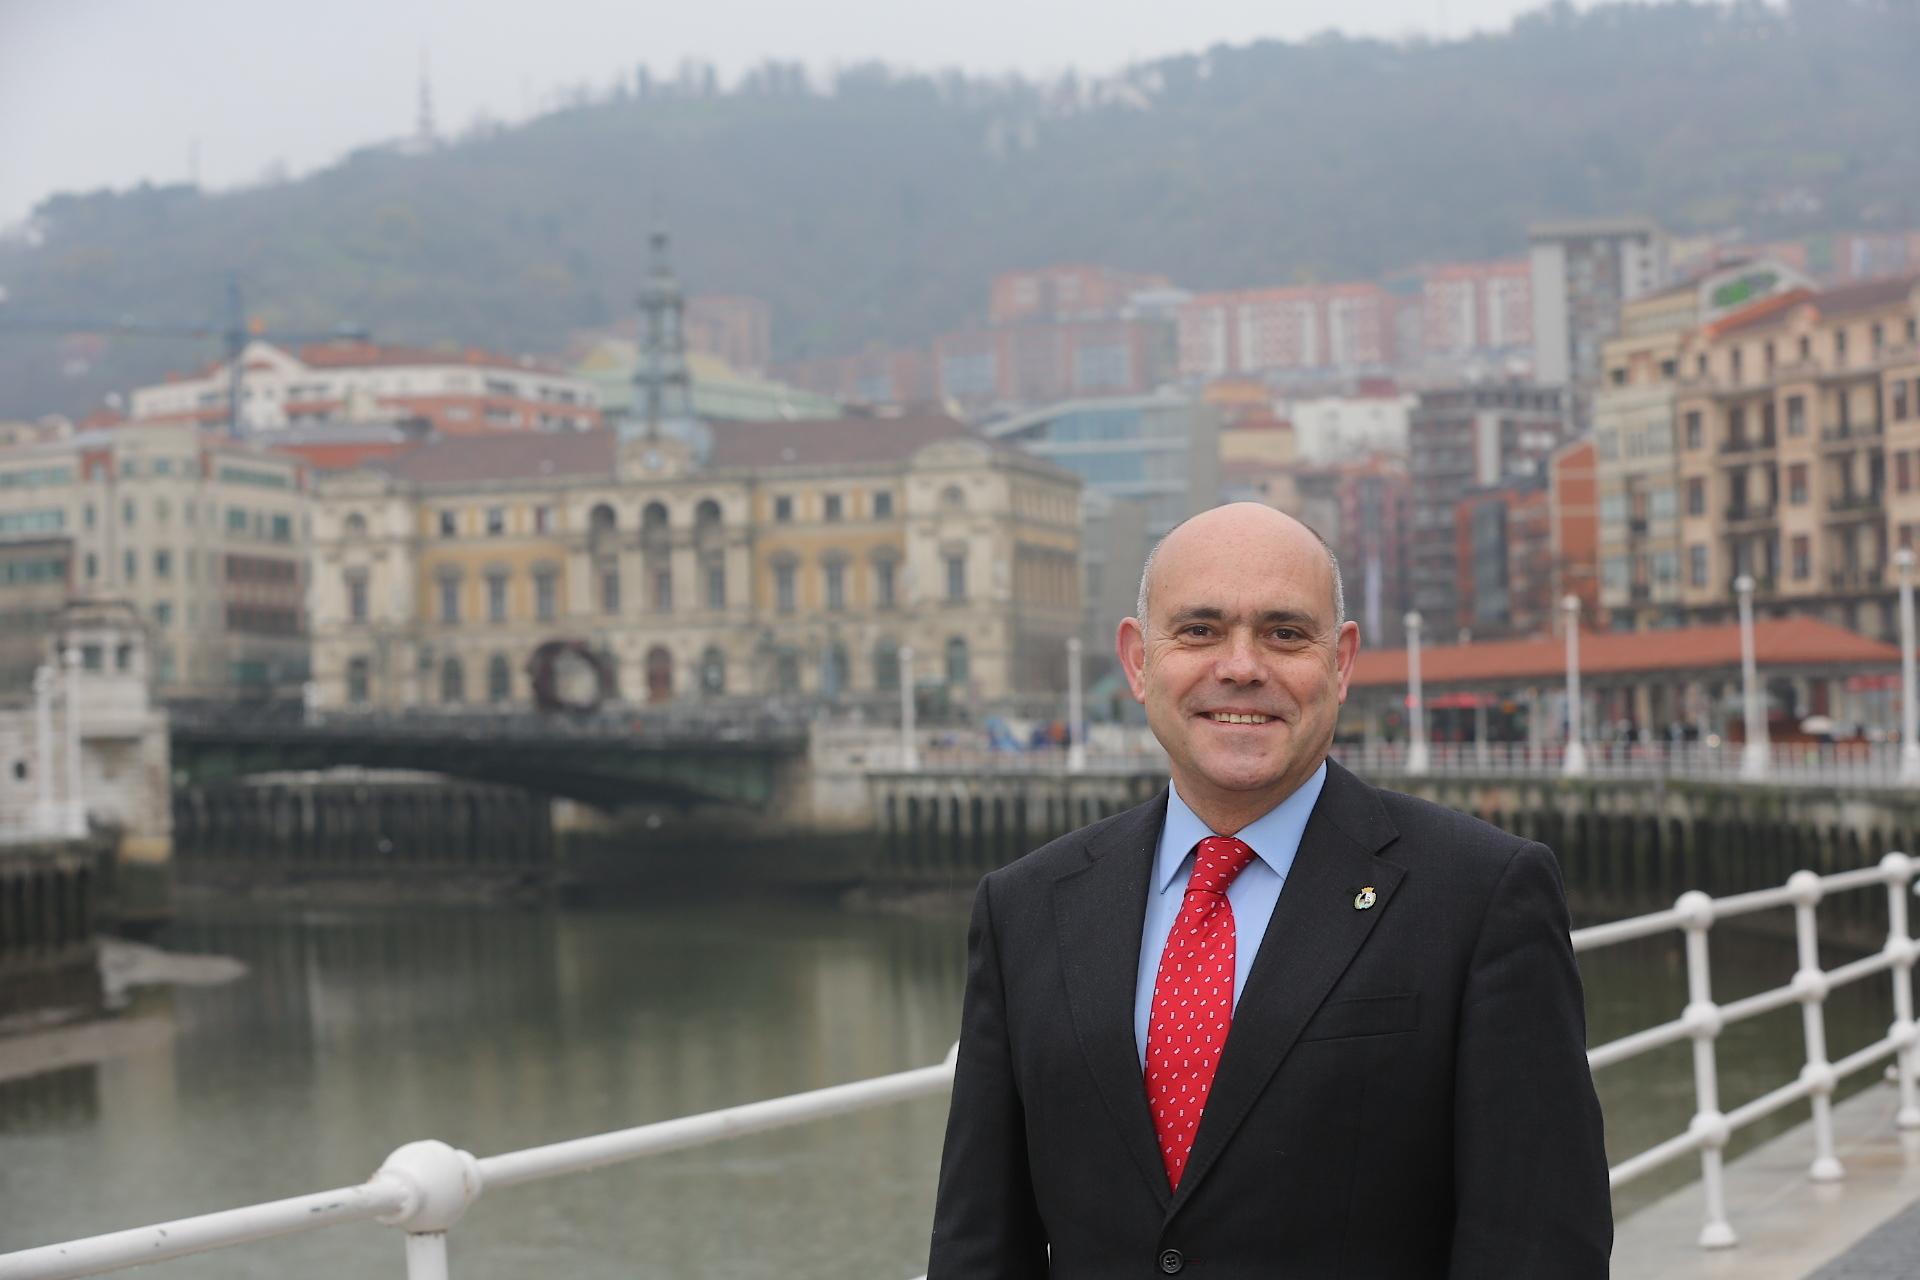 20150321 Bilbao 10 Tomas del Hierro Gurrutxaga 0006